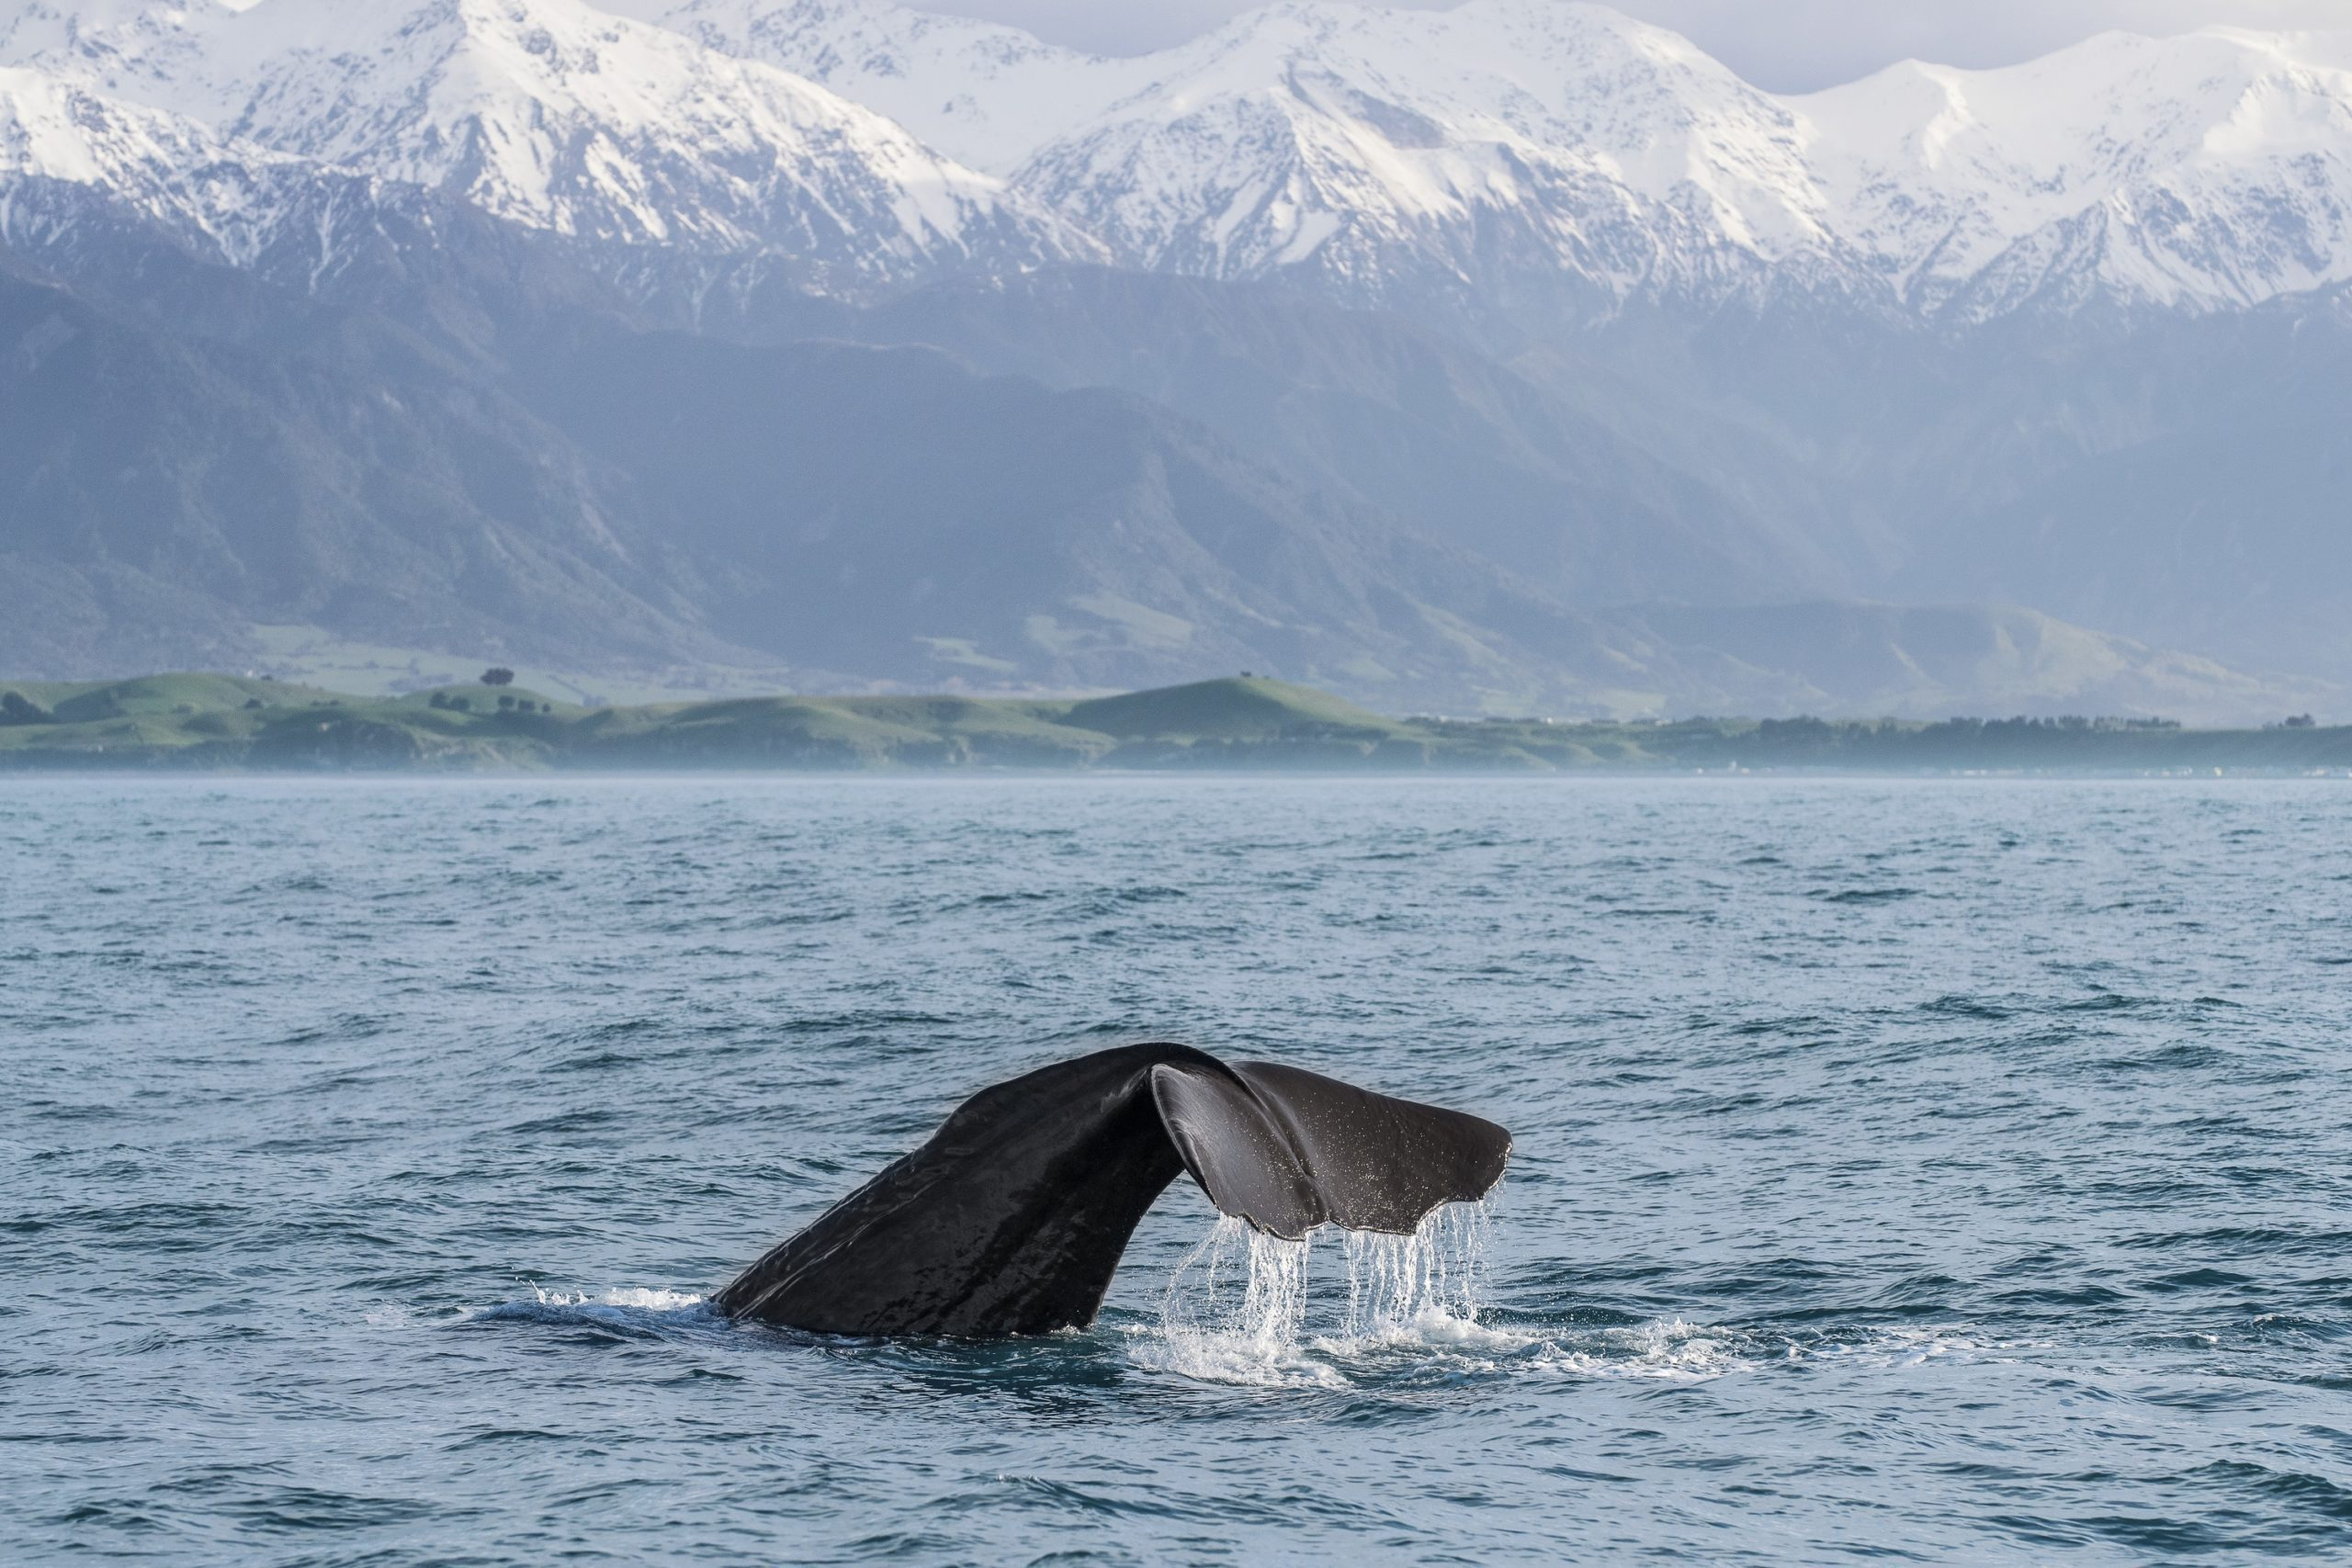 whale tale off the coast of kaikoura